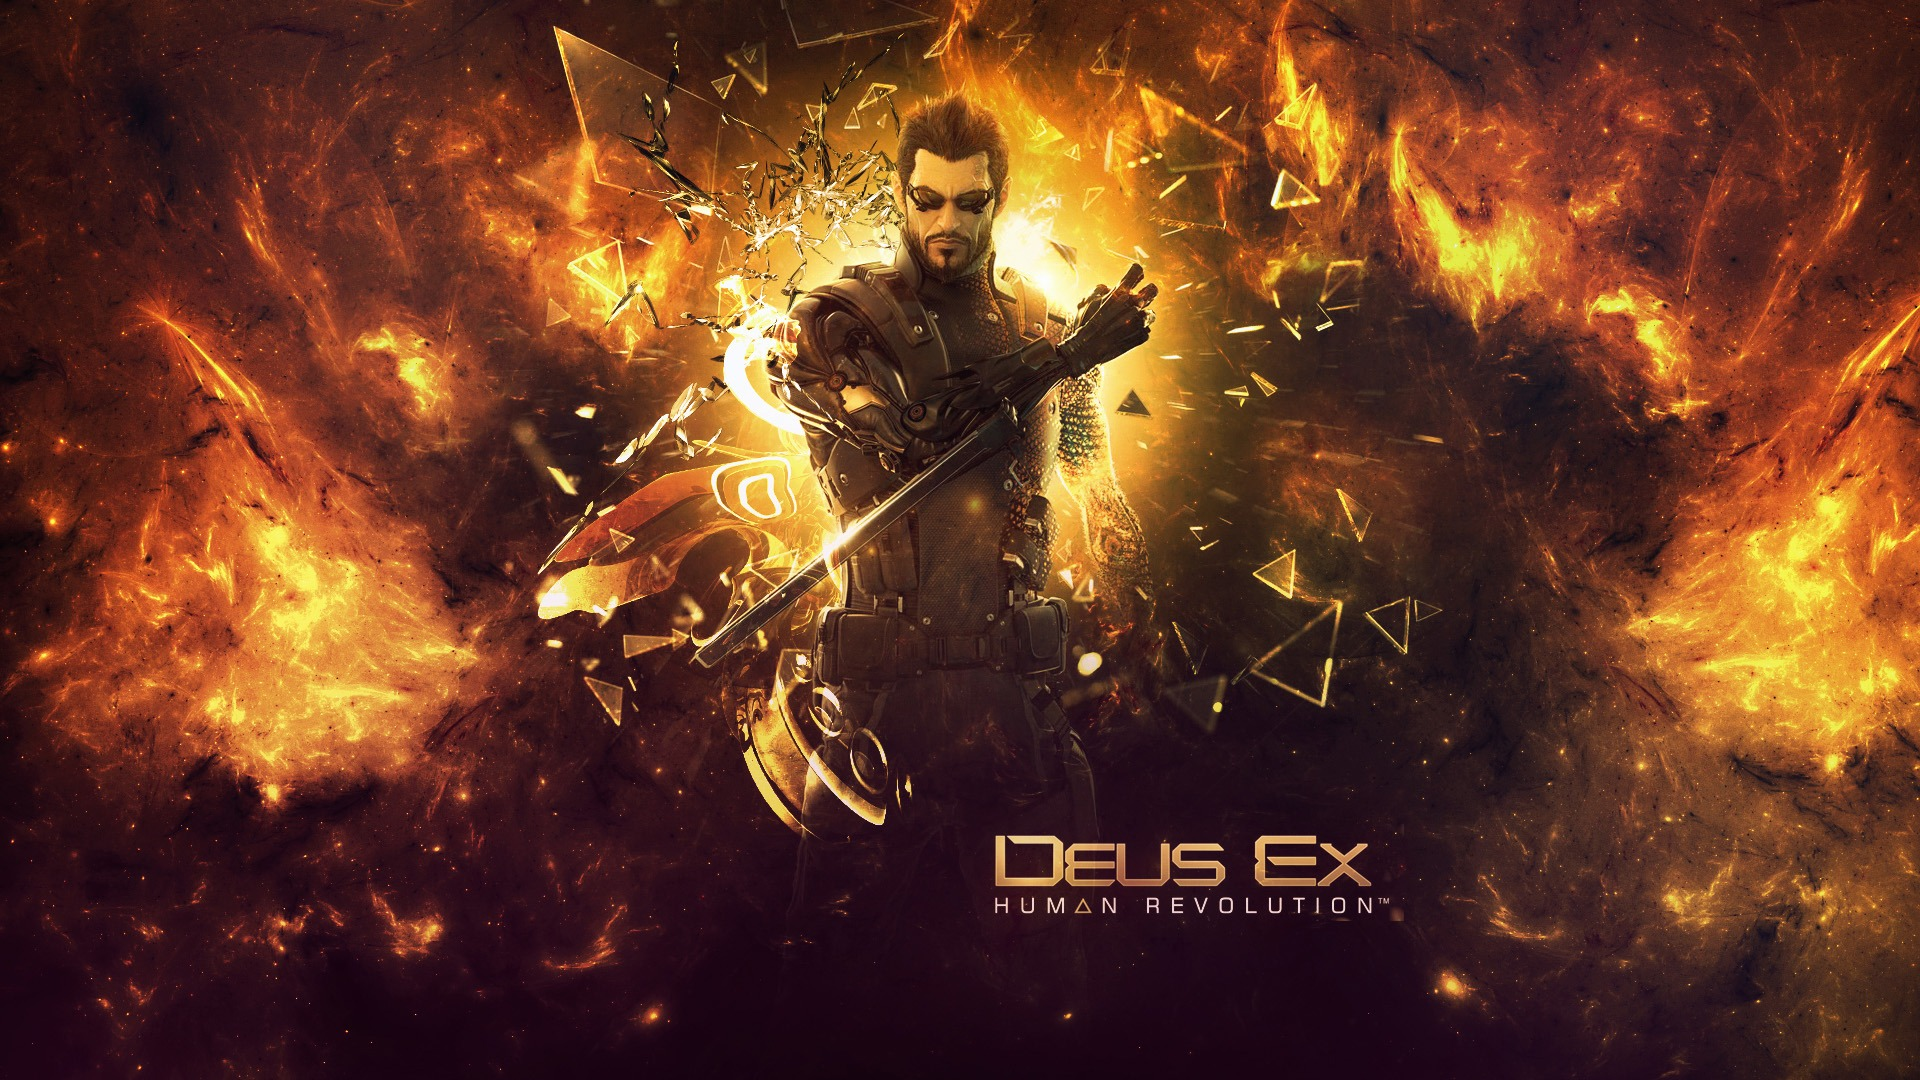 Deus Ex Human Revolution Wallpaper HD Wallpapers Game Wallpaper 16 1920x1080